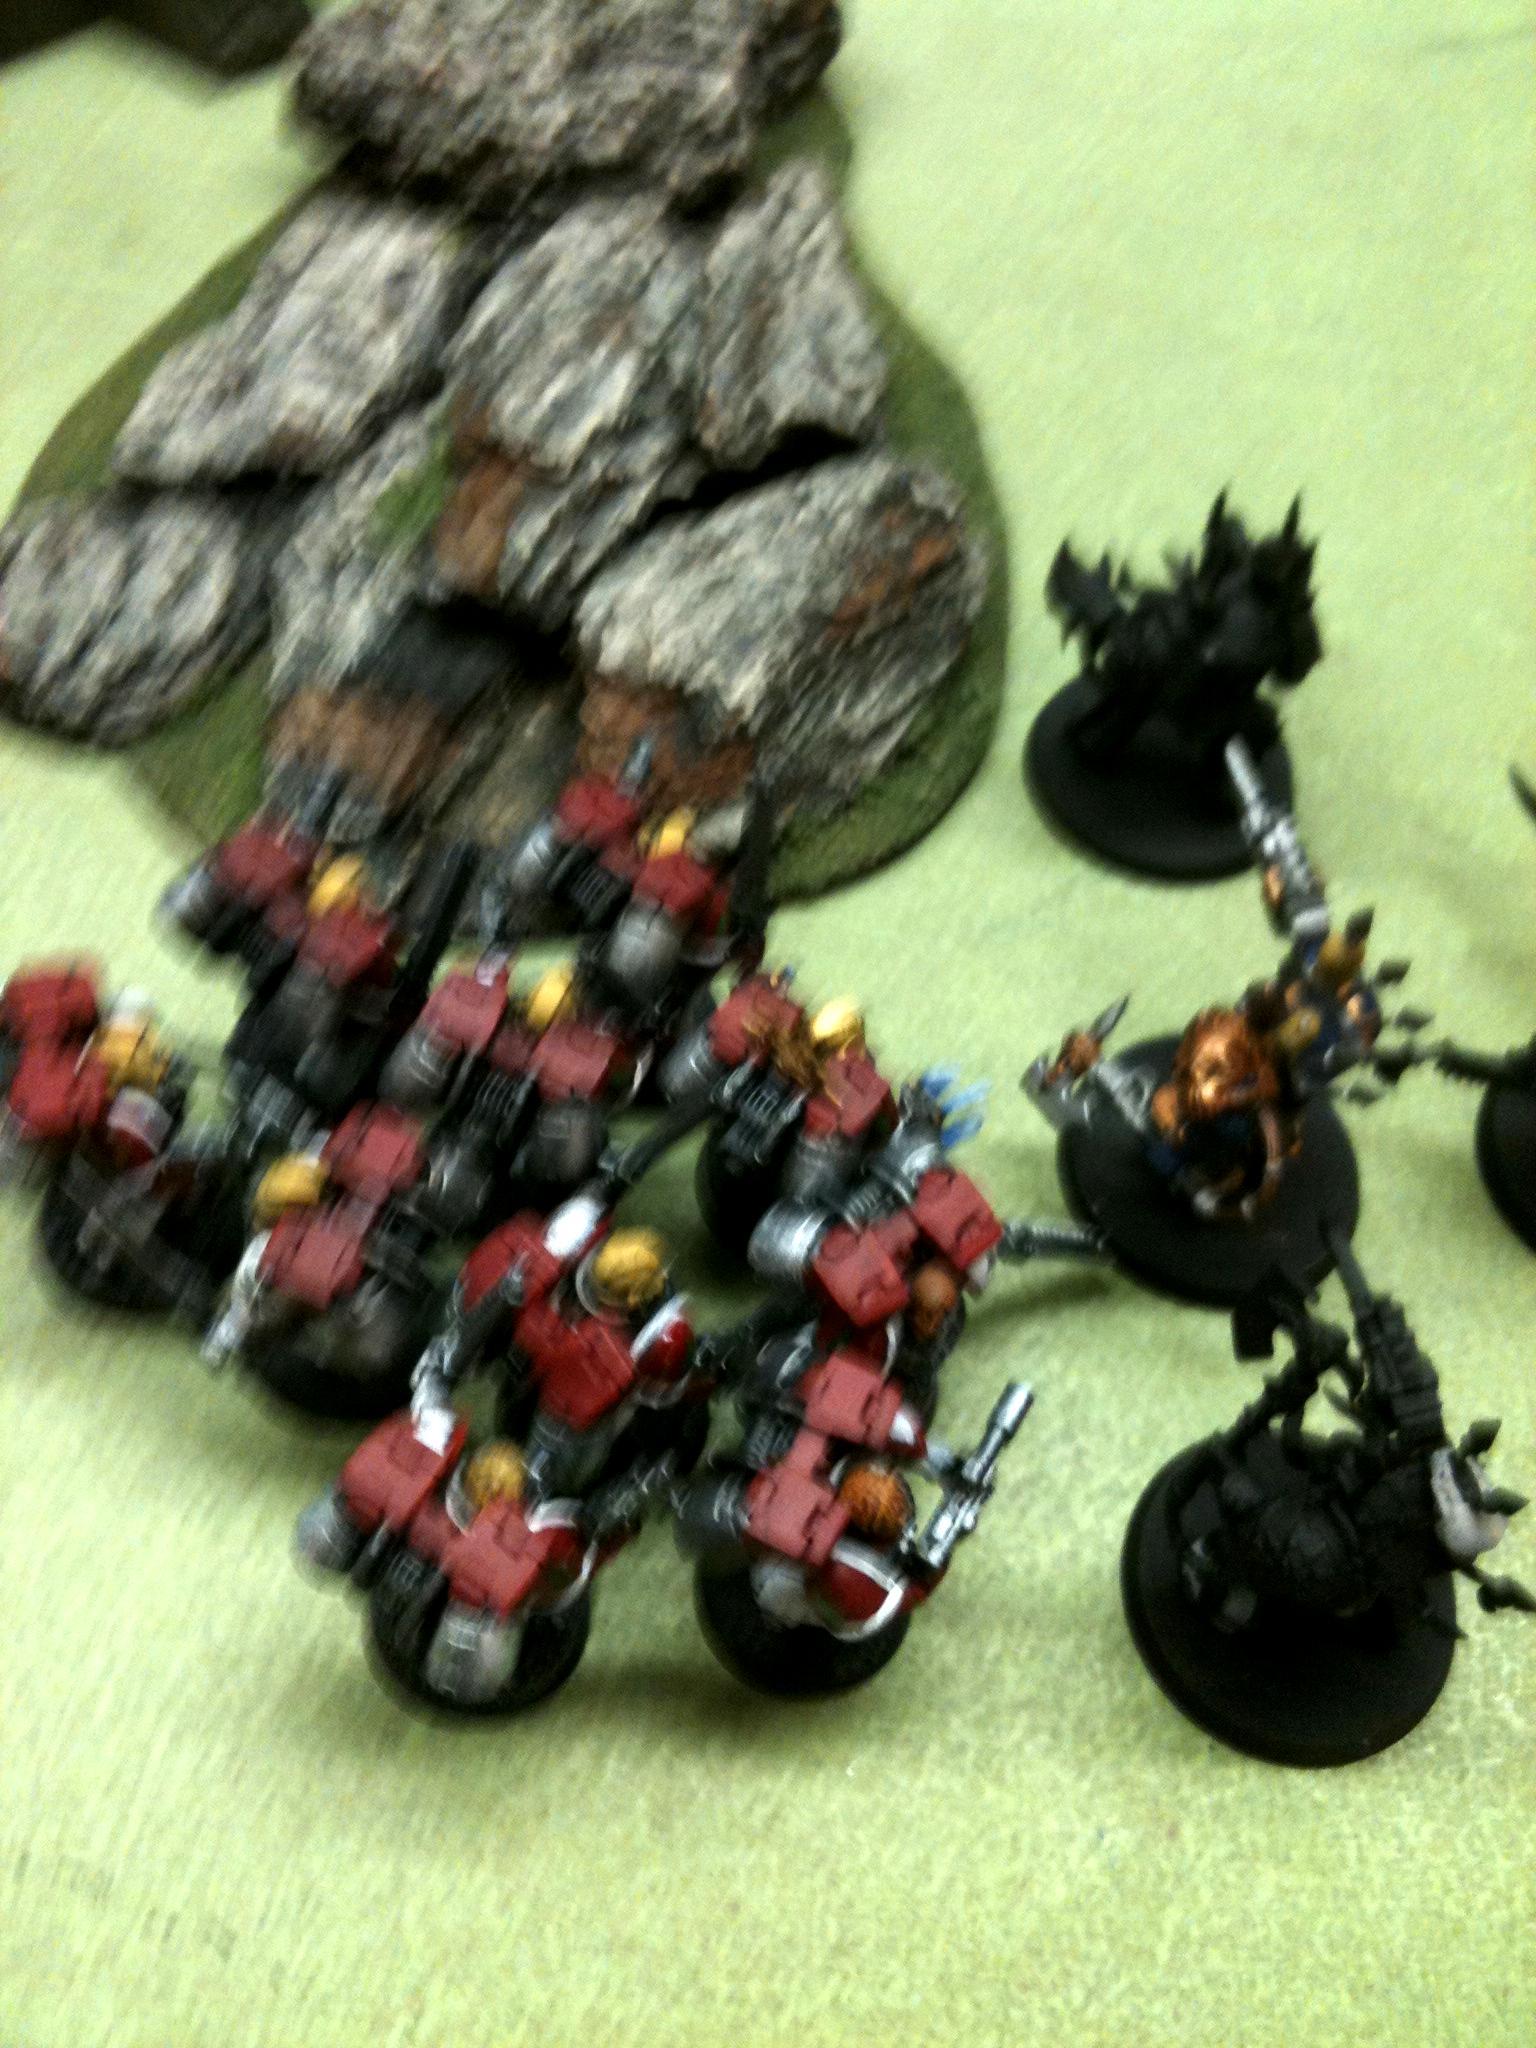 Blurred Photo, Seraphs argent assault squad